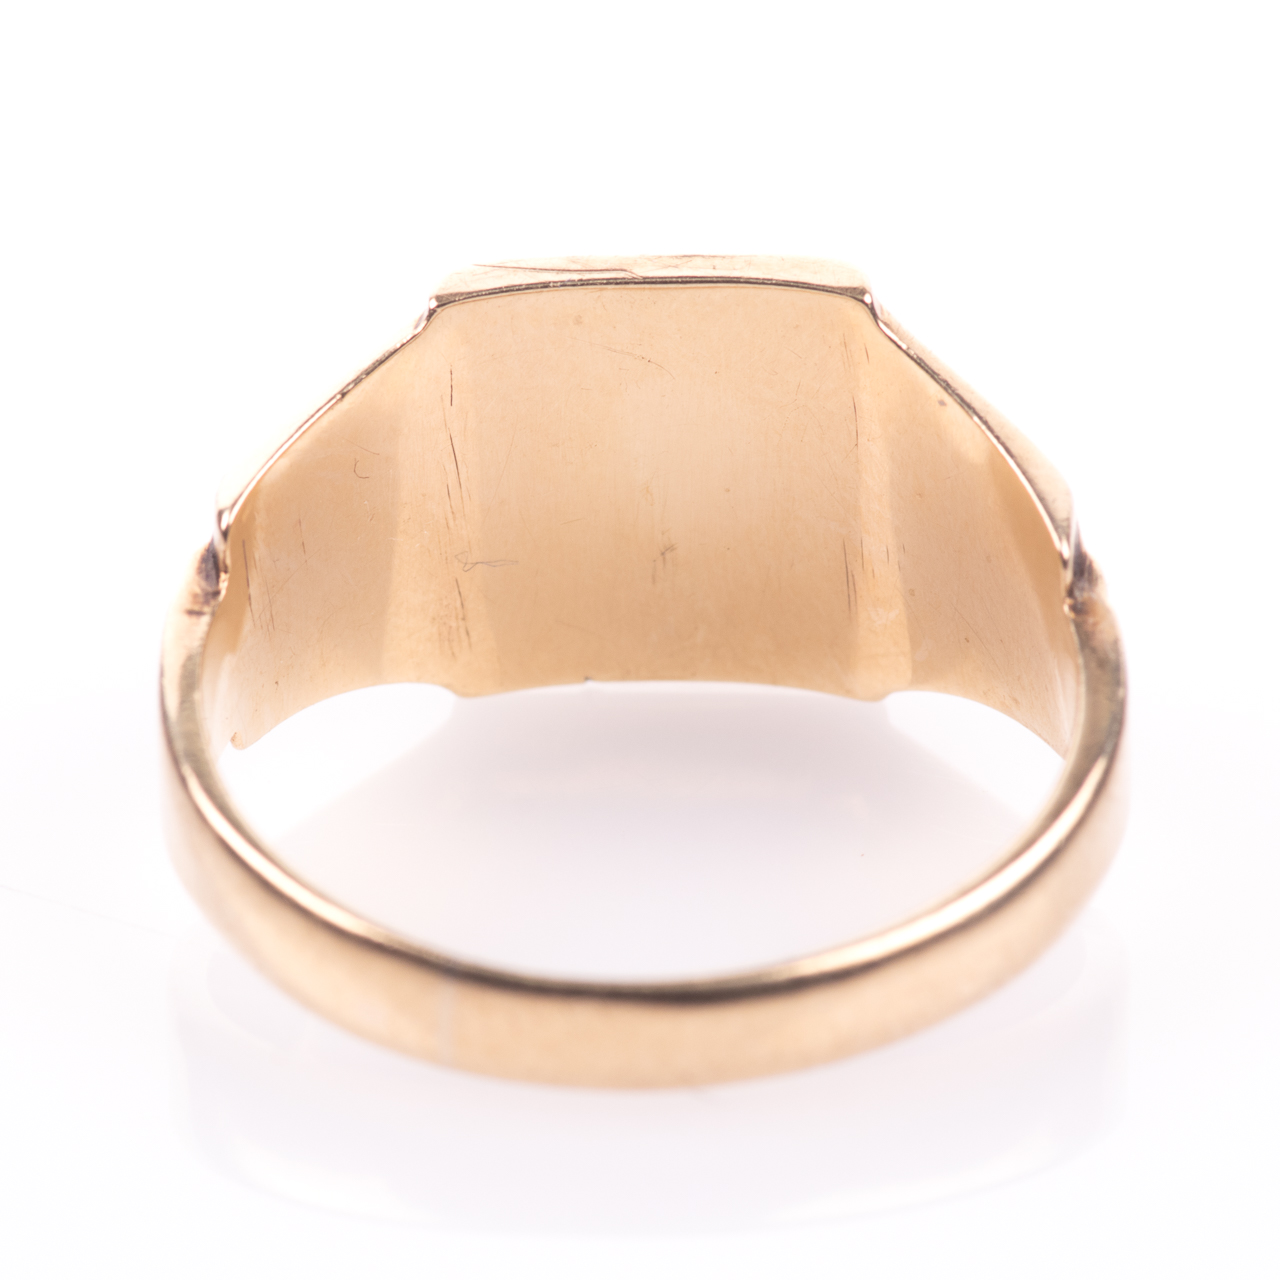 Art Deco Style Gentleman's Signet Ring 9ct Gold - Image 6 of 7